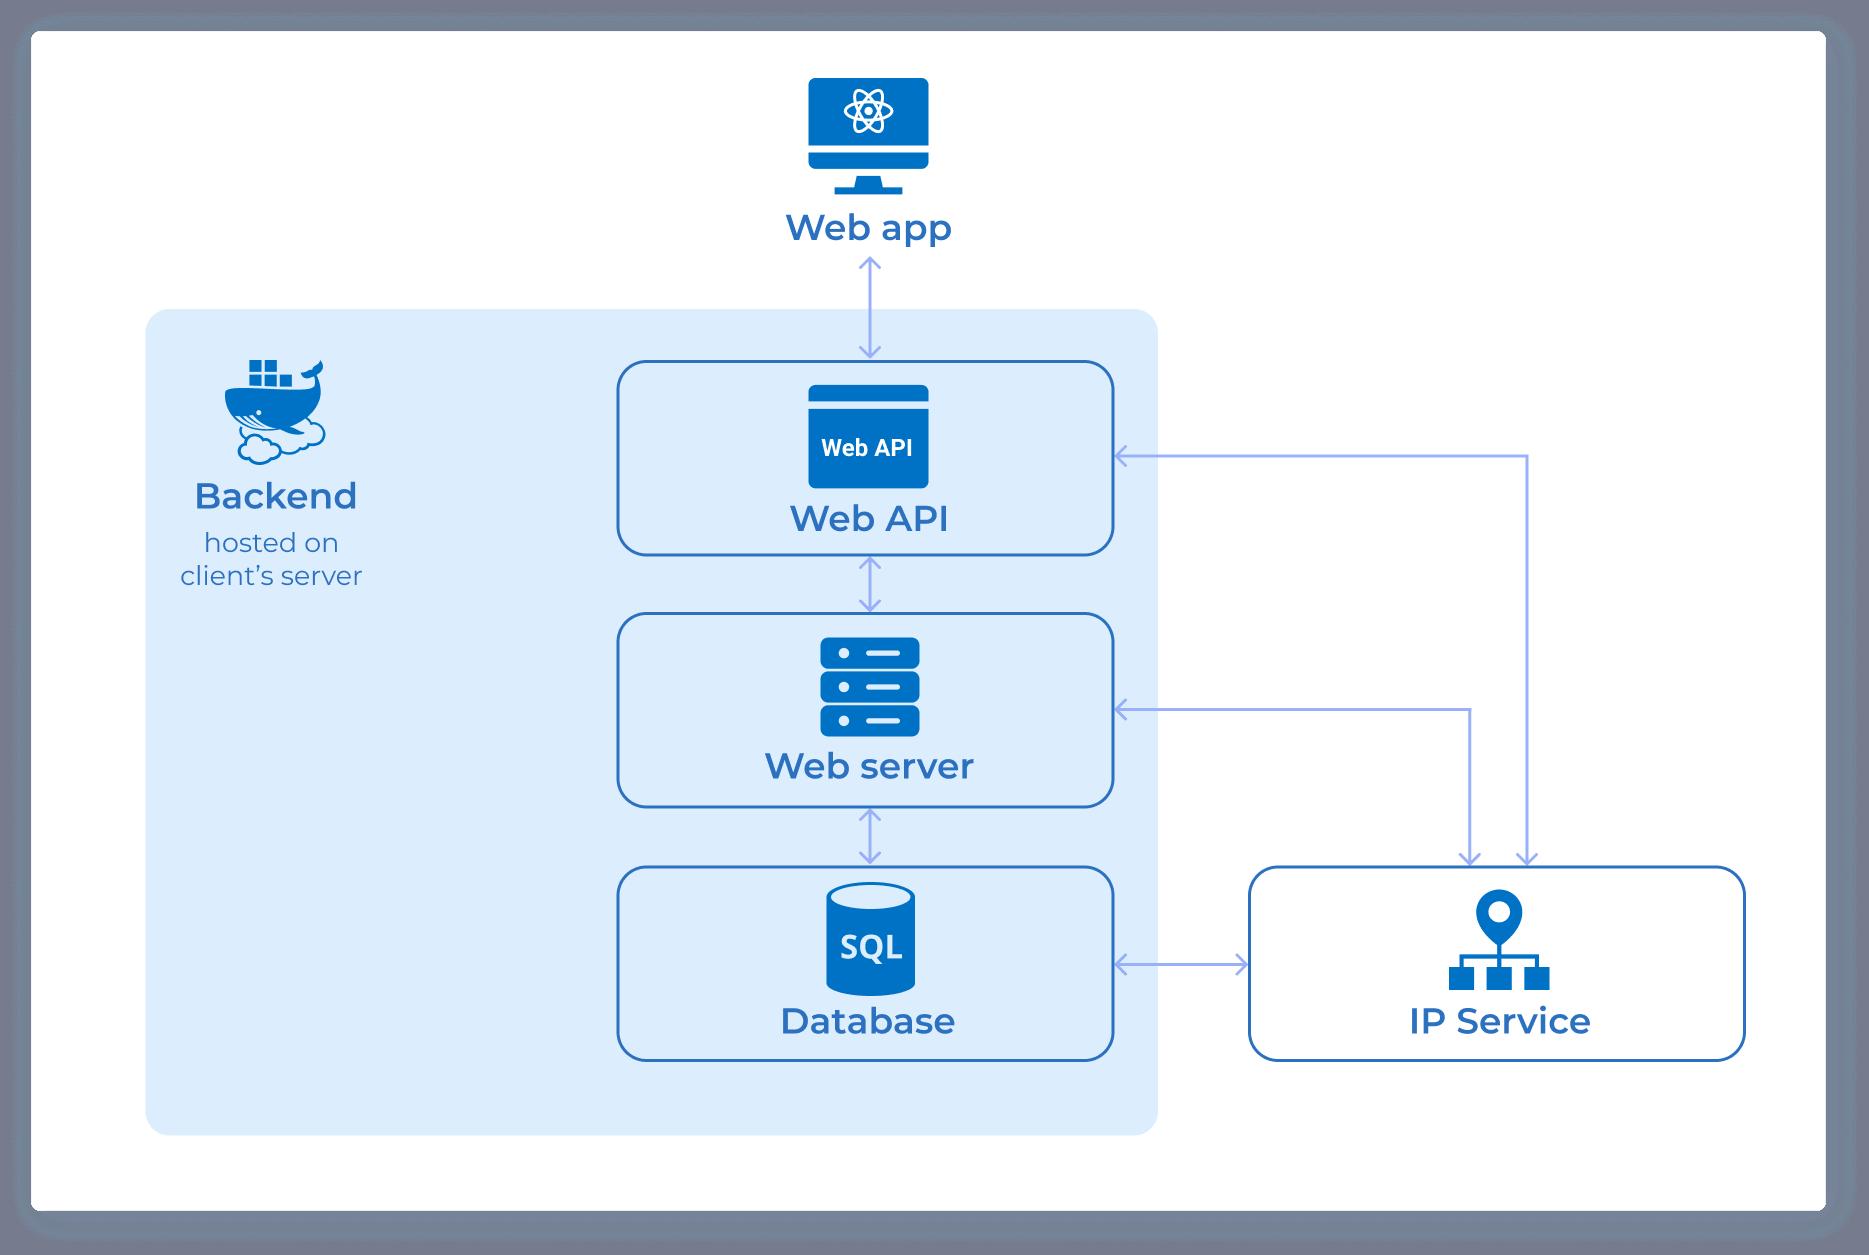 VisBook Solution Architecture